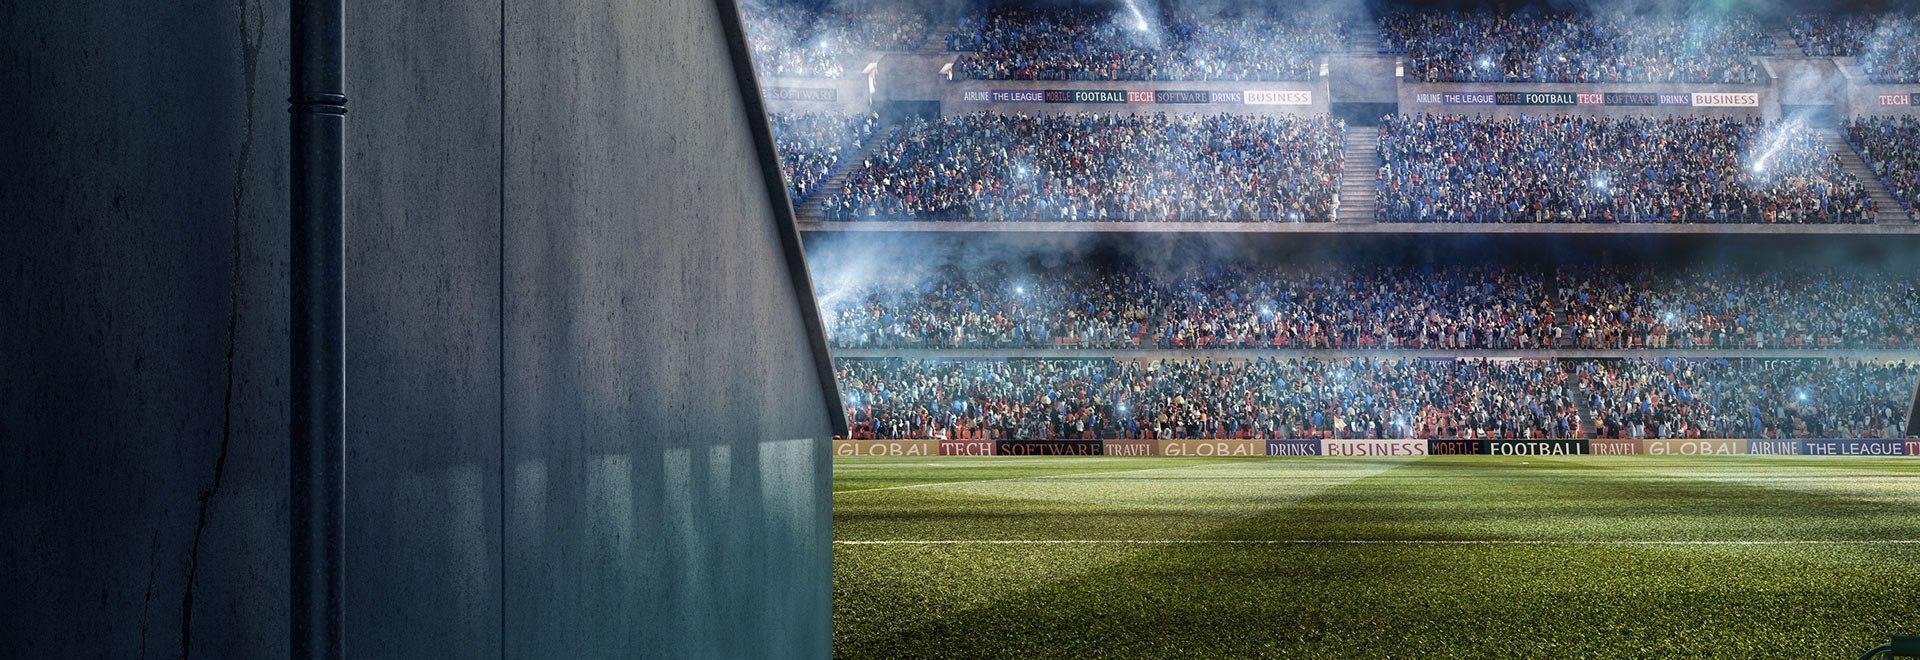 Matelica - Sambenedettese. Playoff 1° turno